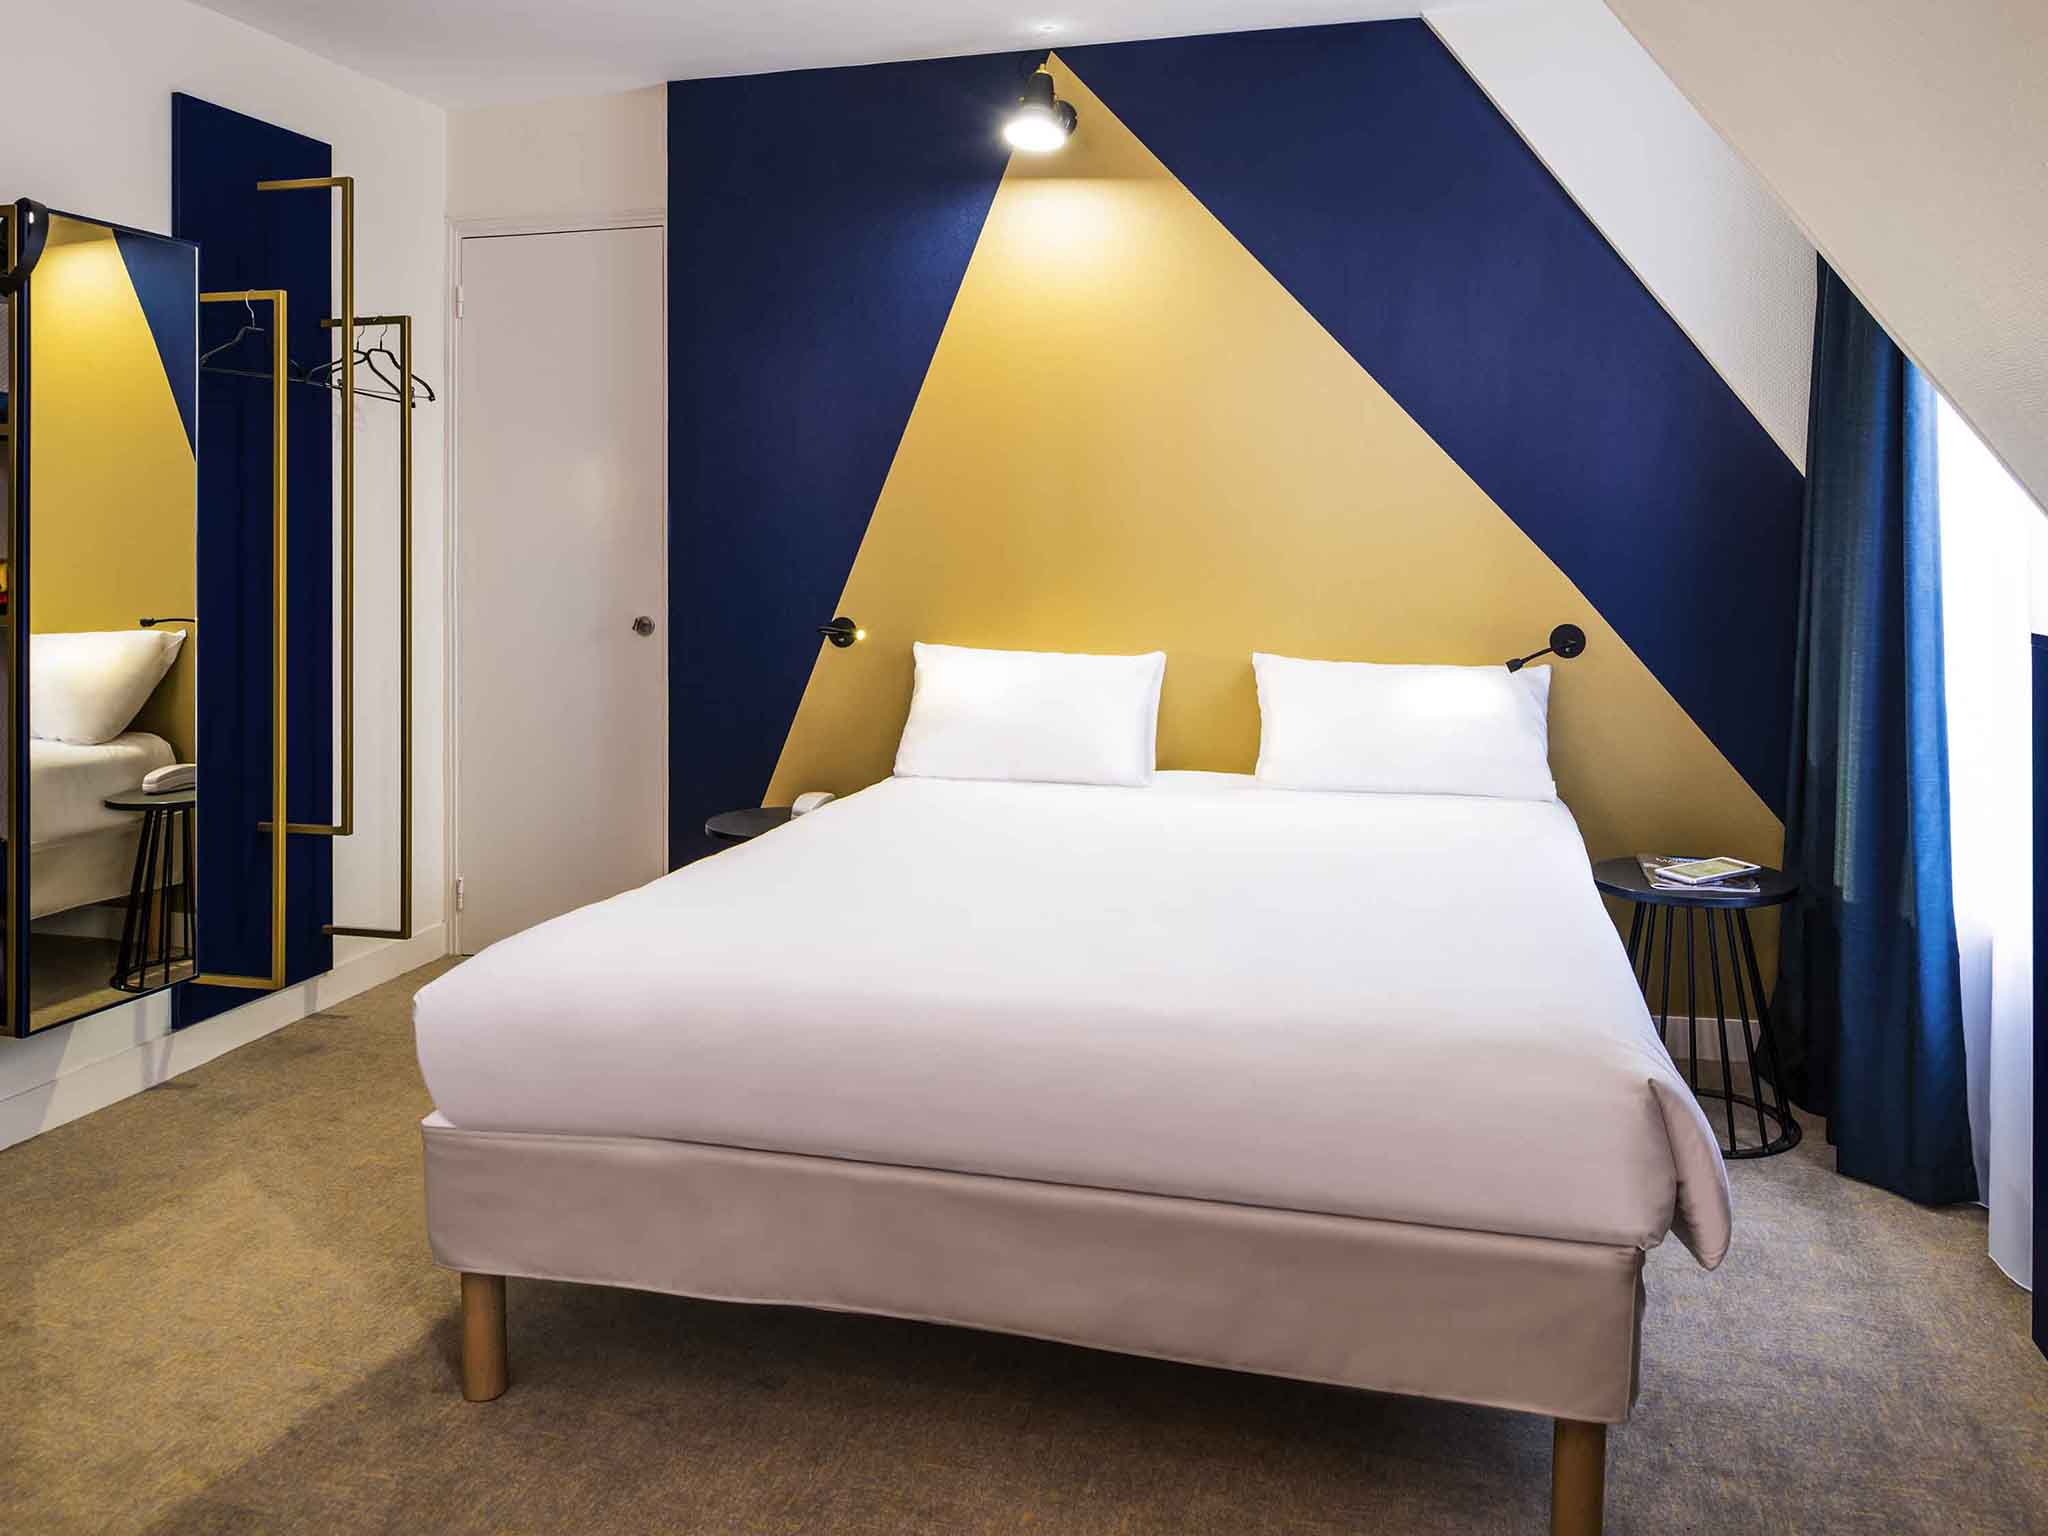 Hotel – Hotel ibis Styles Parigi 15 Lecourbe